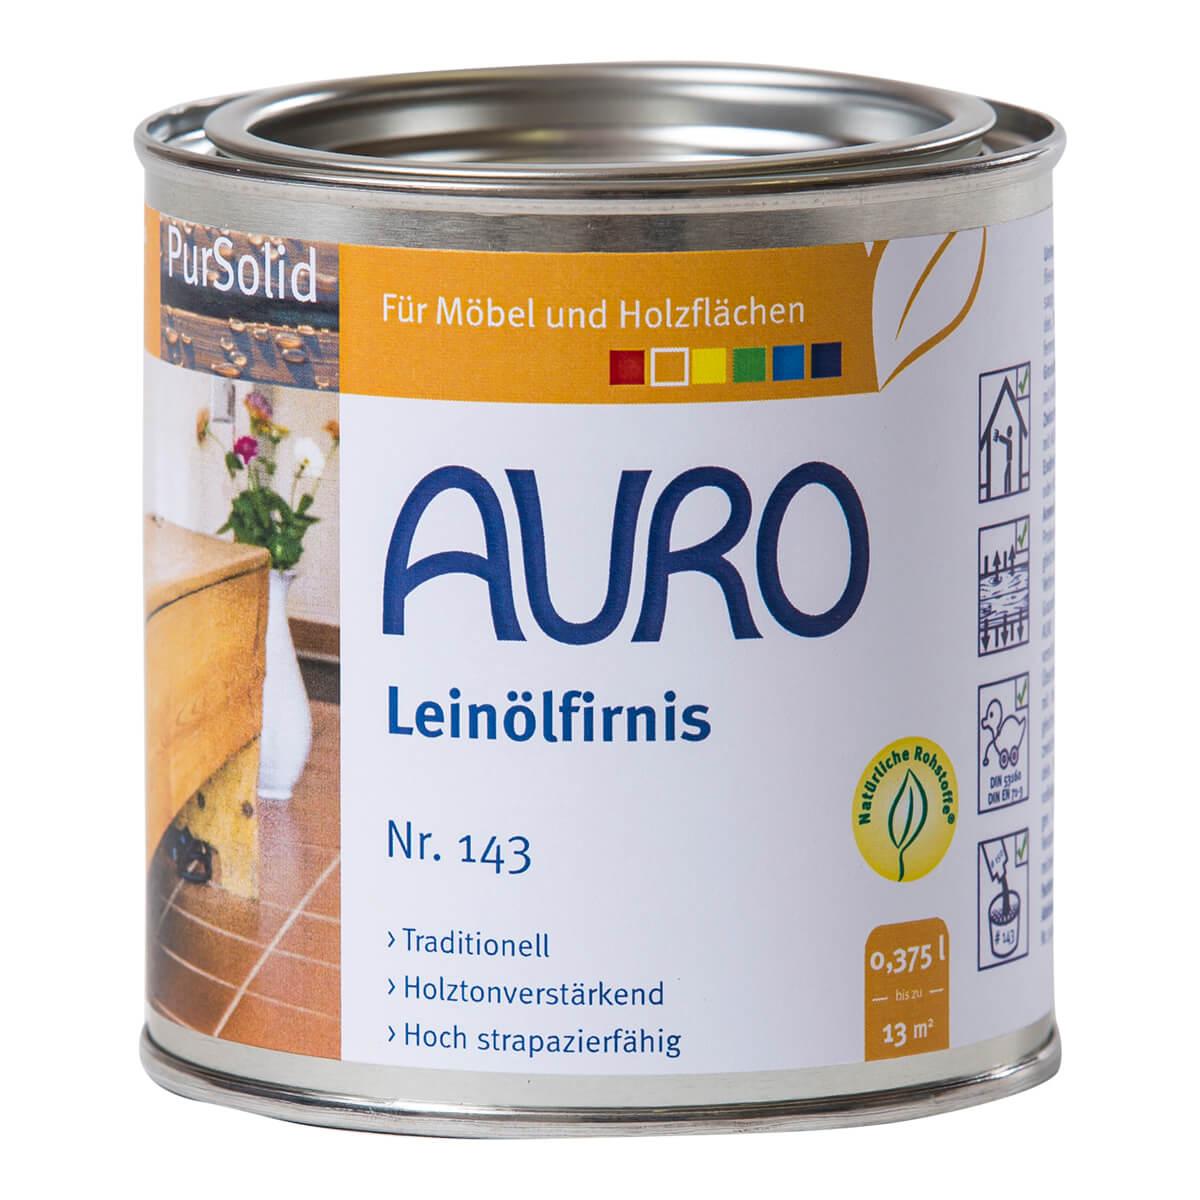 AURO Leinölfirnis